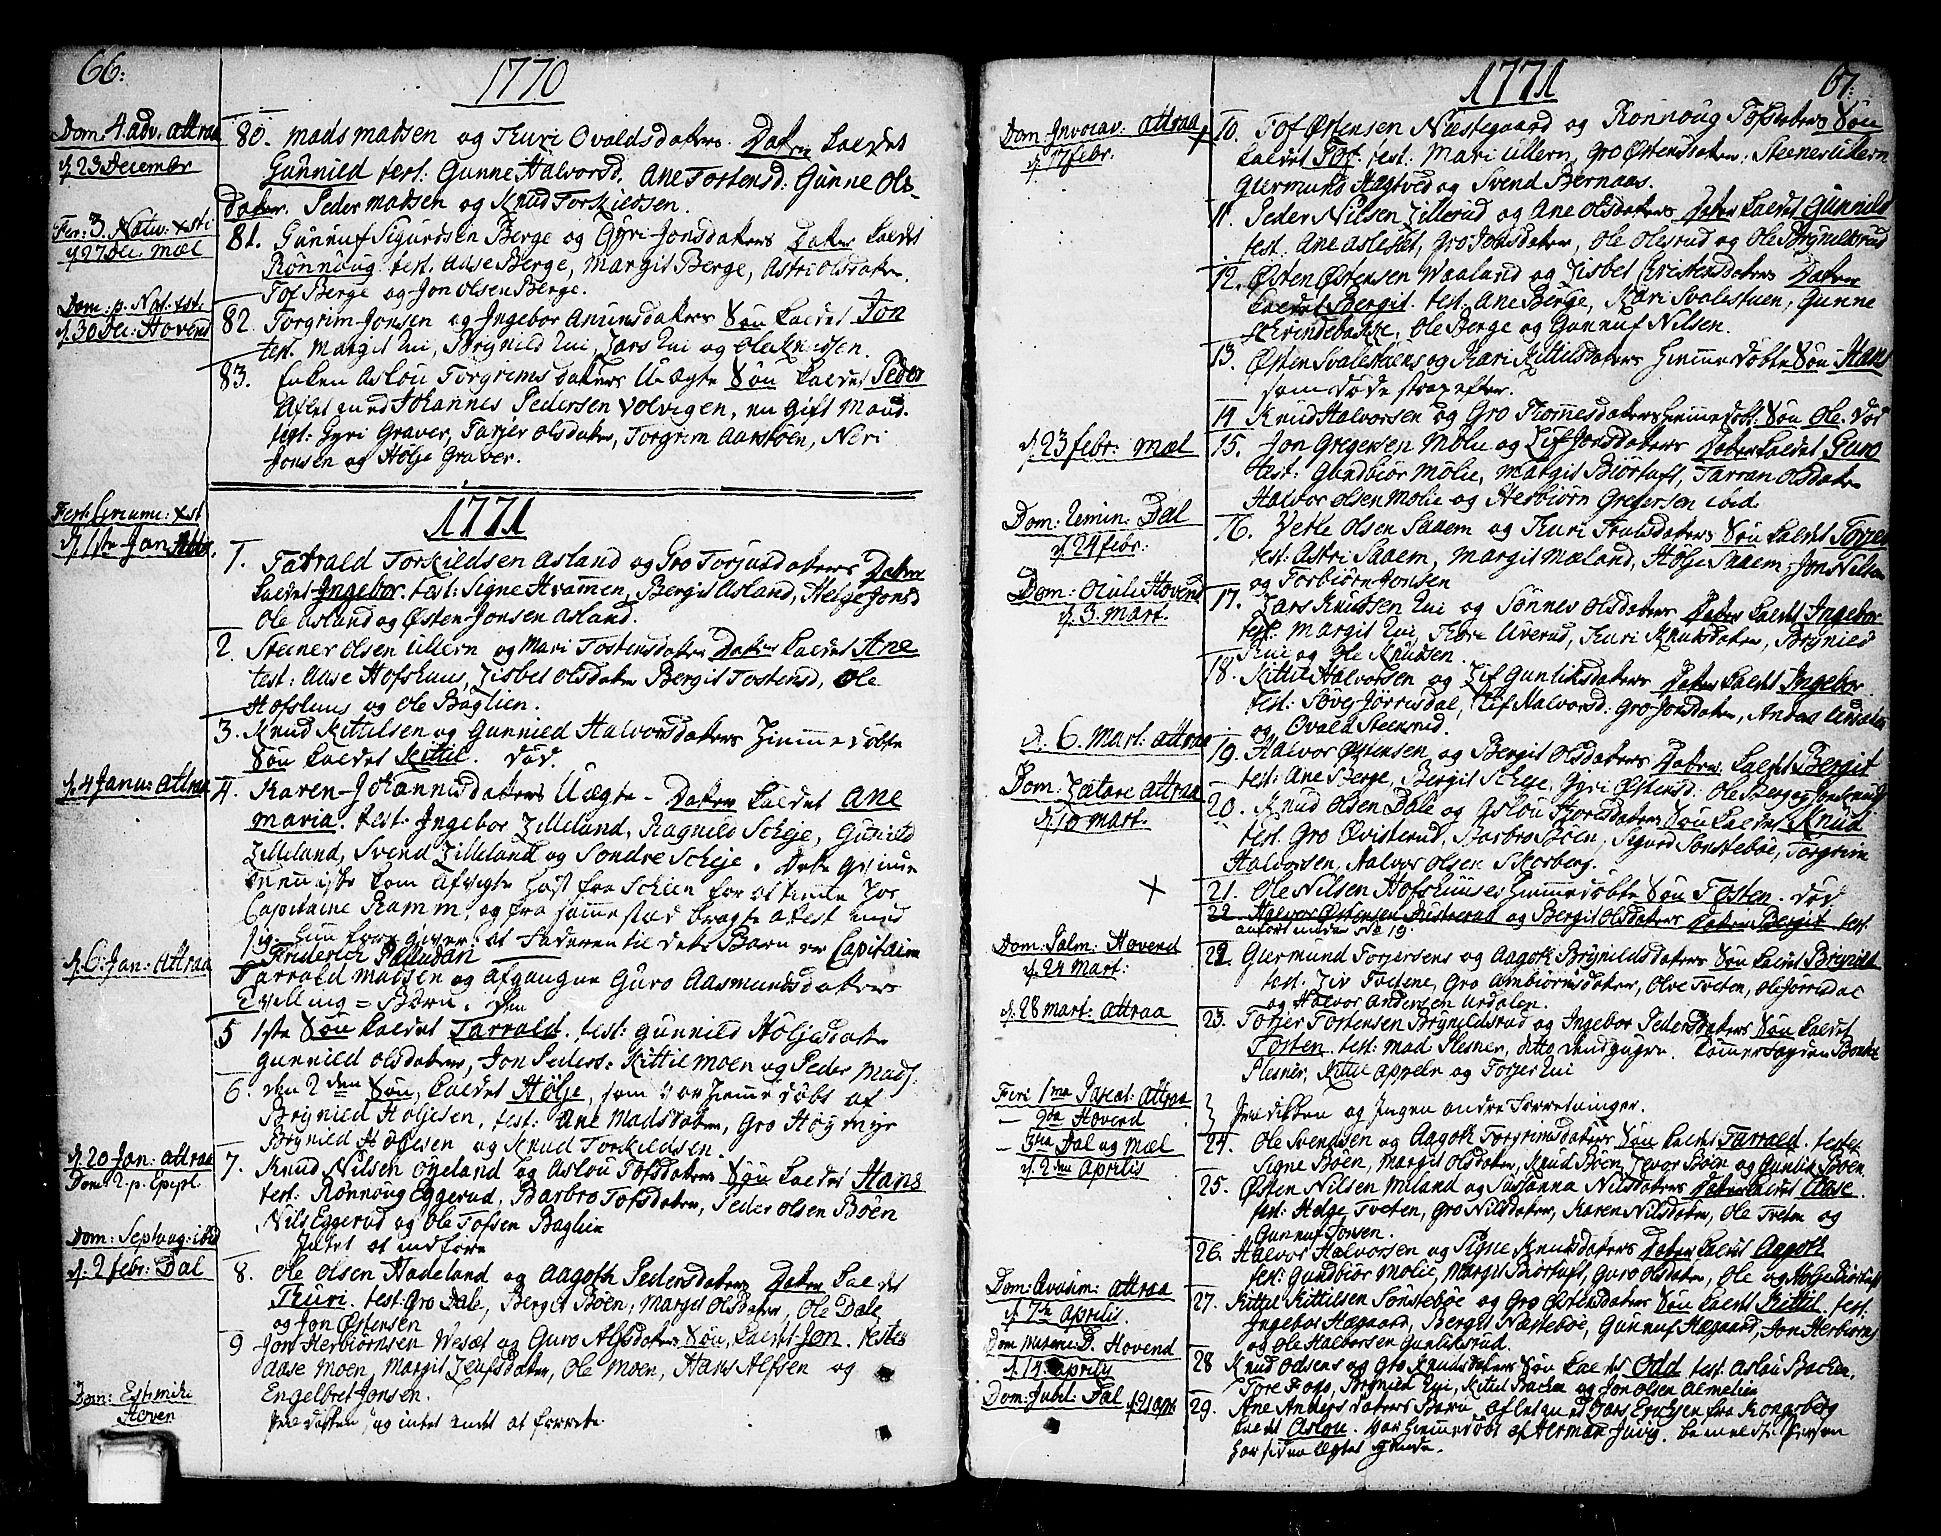 SAKO, Tinn kirkebøker, F/Fa/L0002: Ministerialbok nr. I 2, 1757-1810, s. 66-67